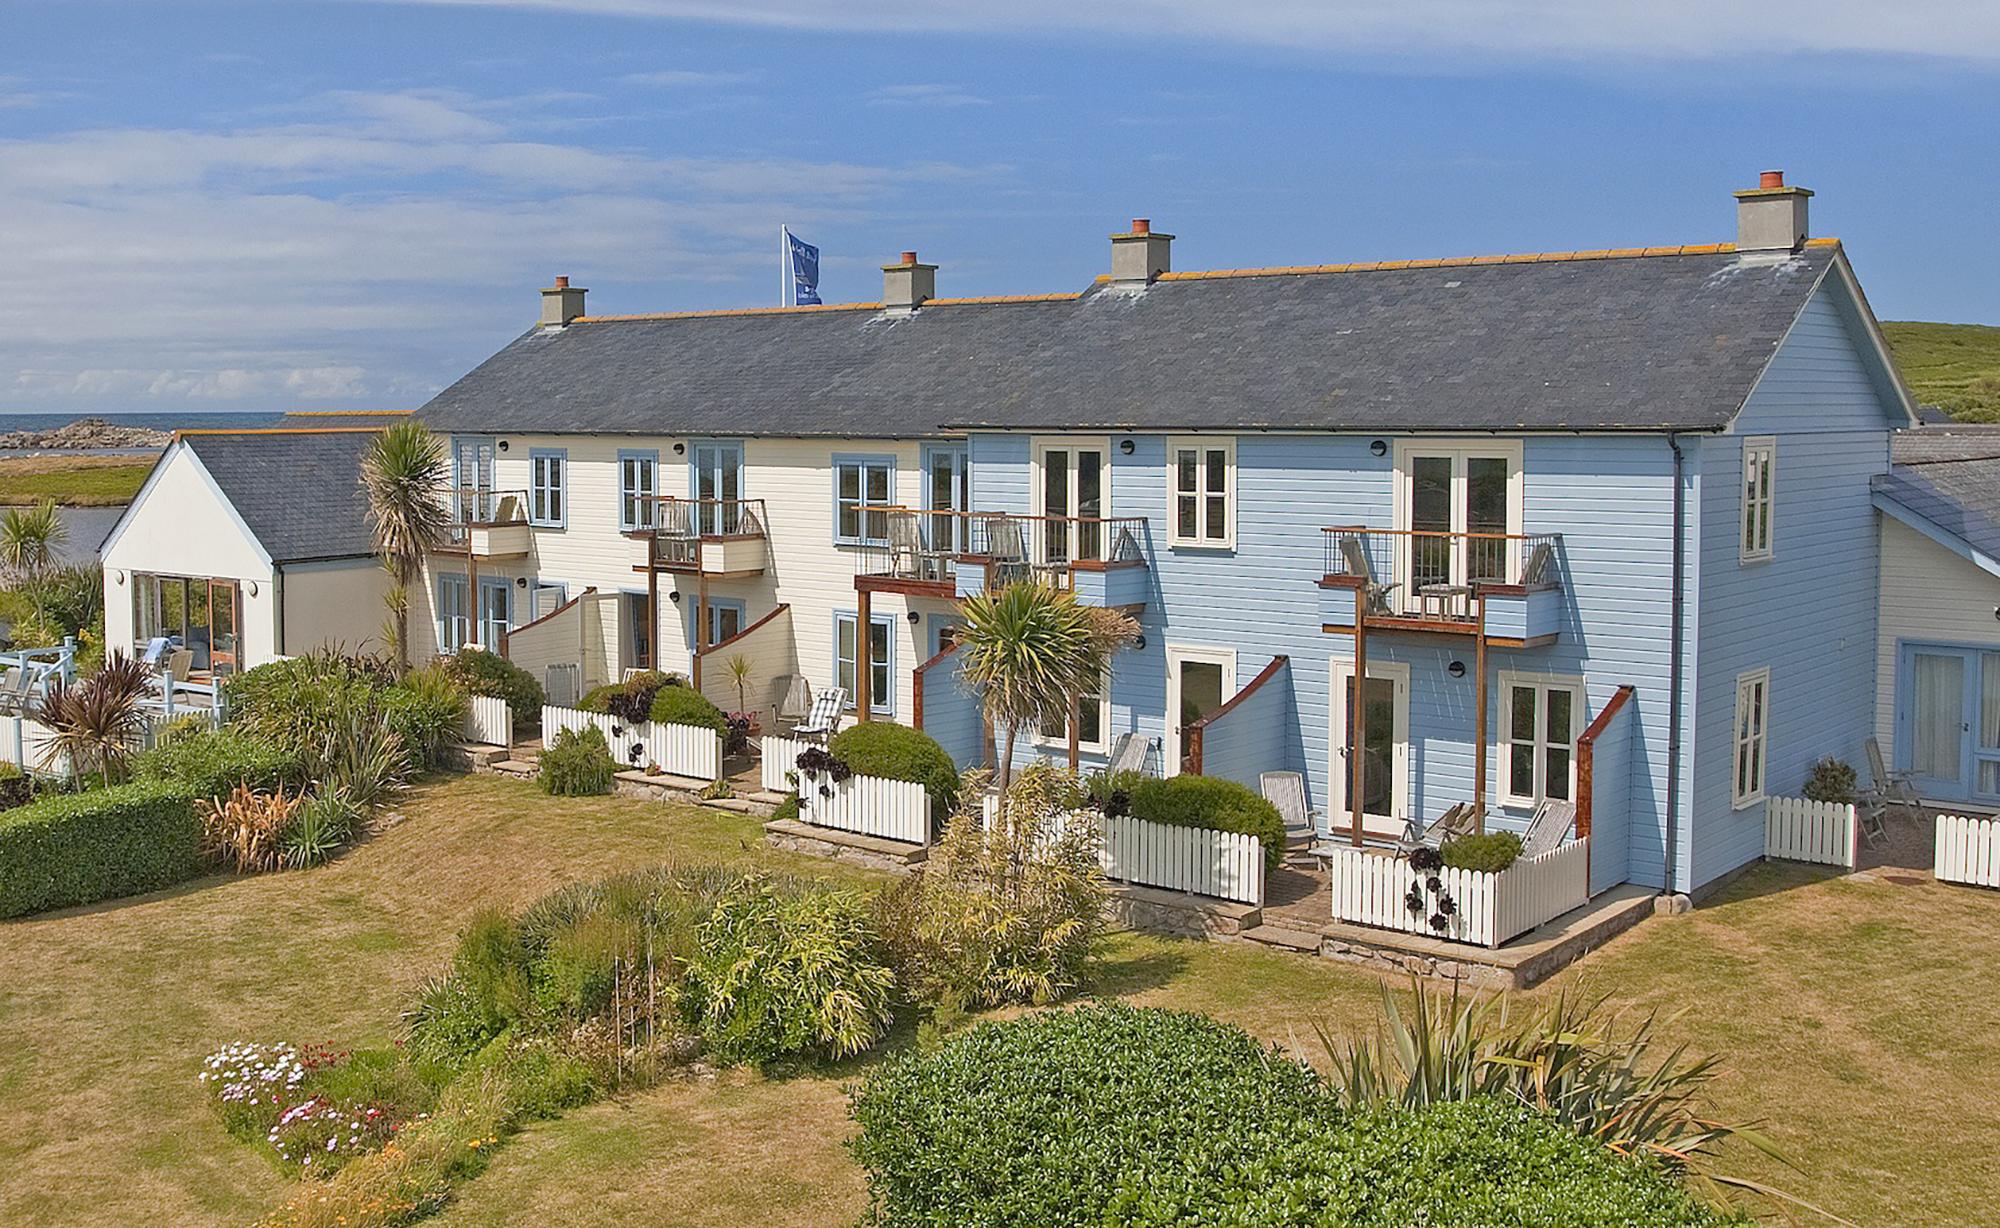 Hell Bay Hotel, Isle of Bryher, UK